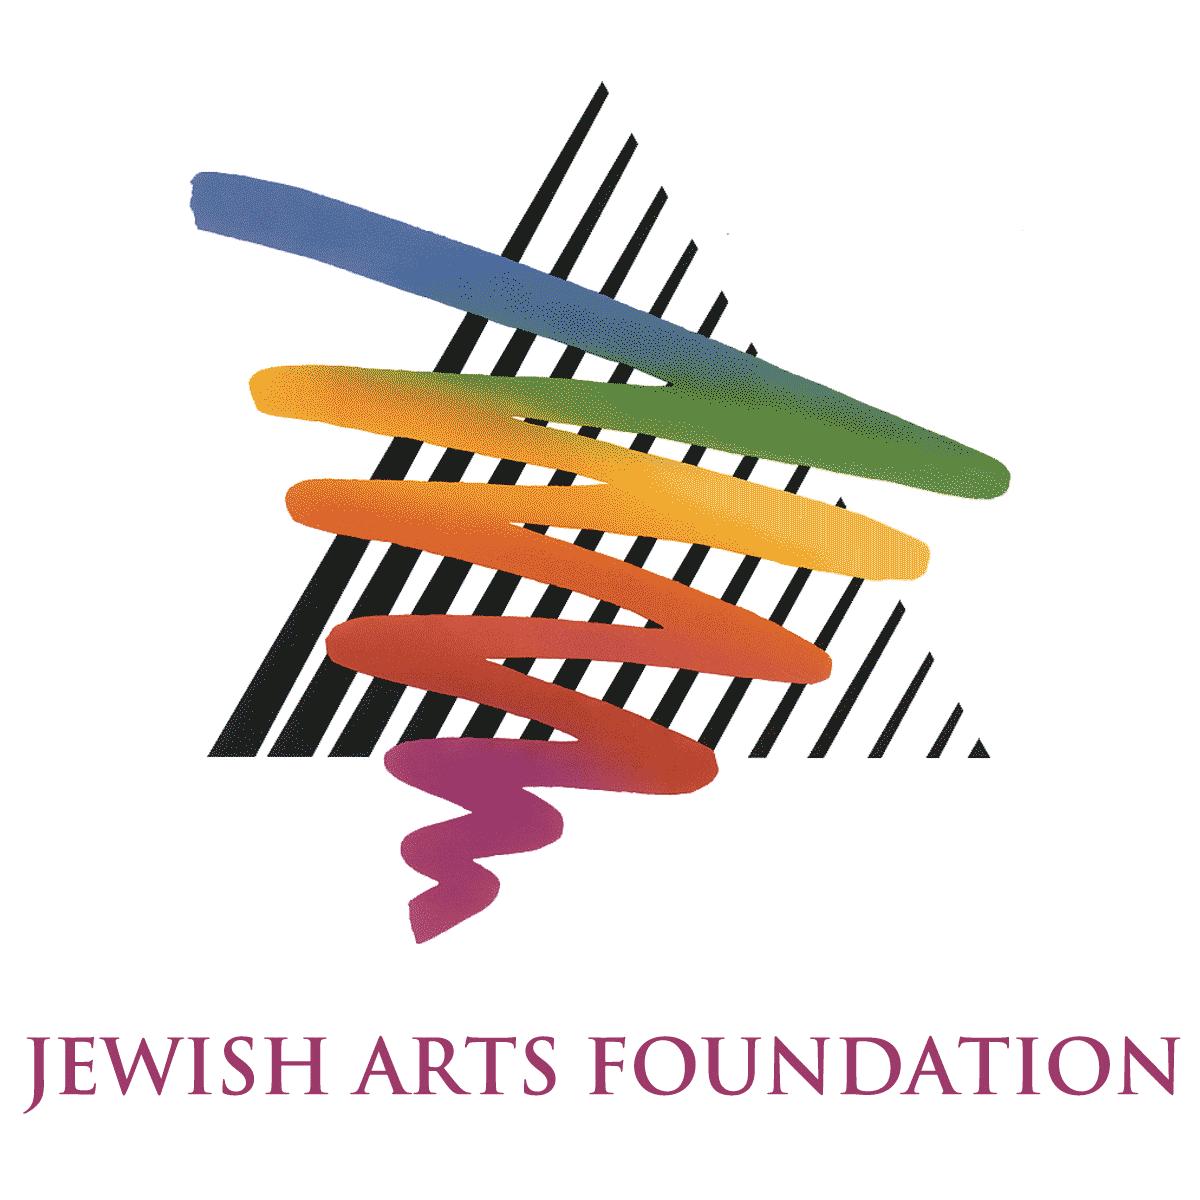 Jewish arts foundation